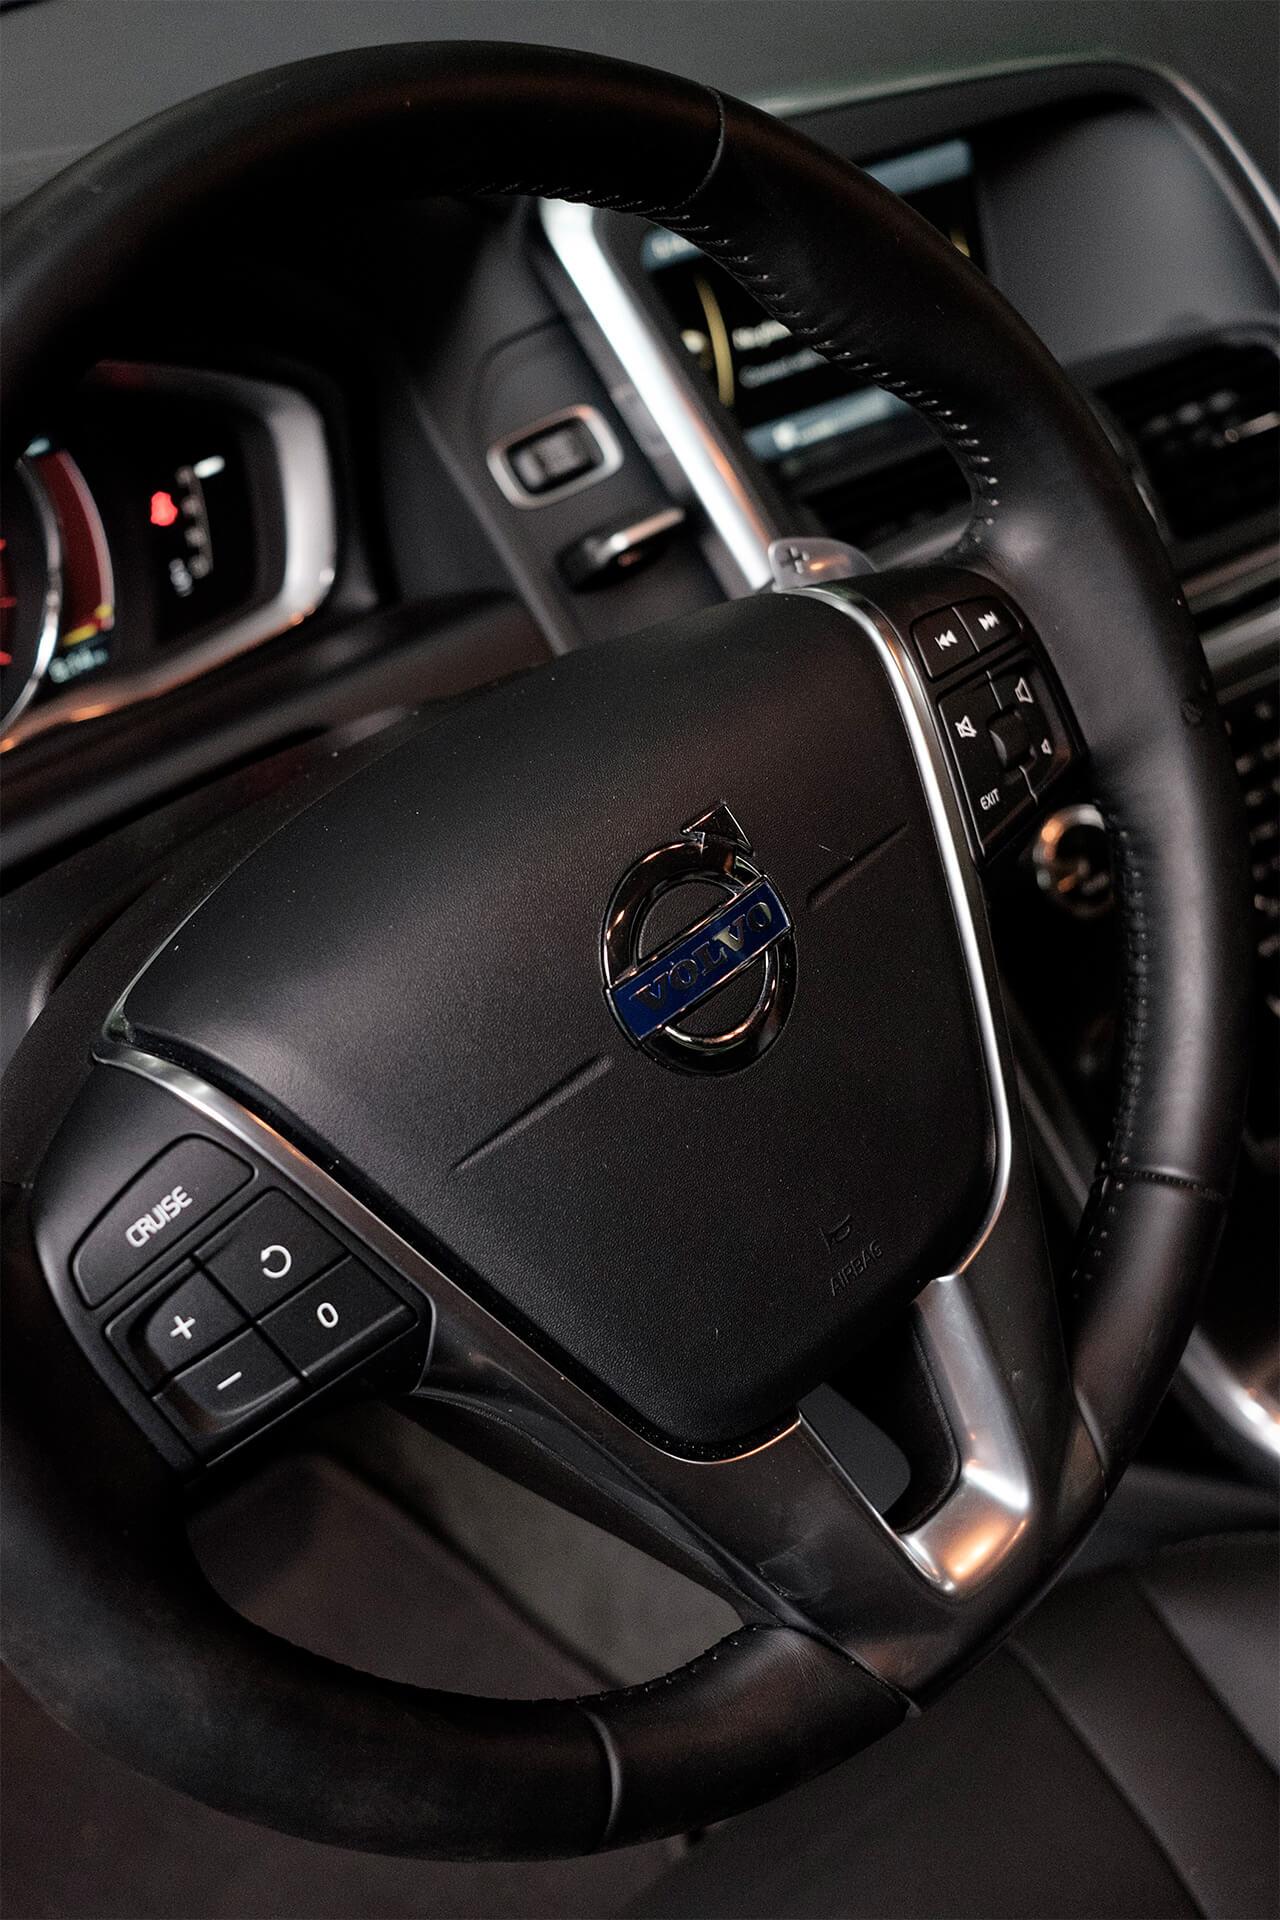 Details of the Volvo XC60 steering wheel